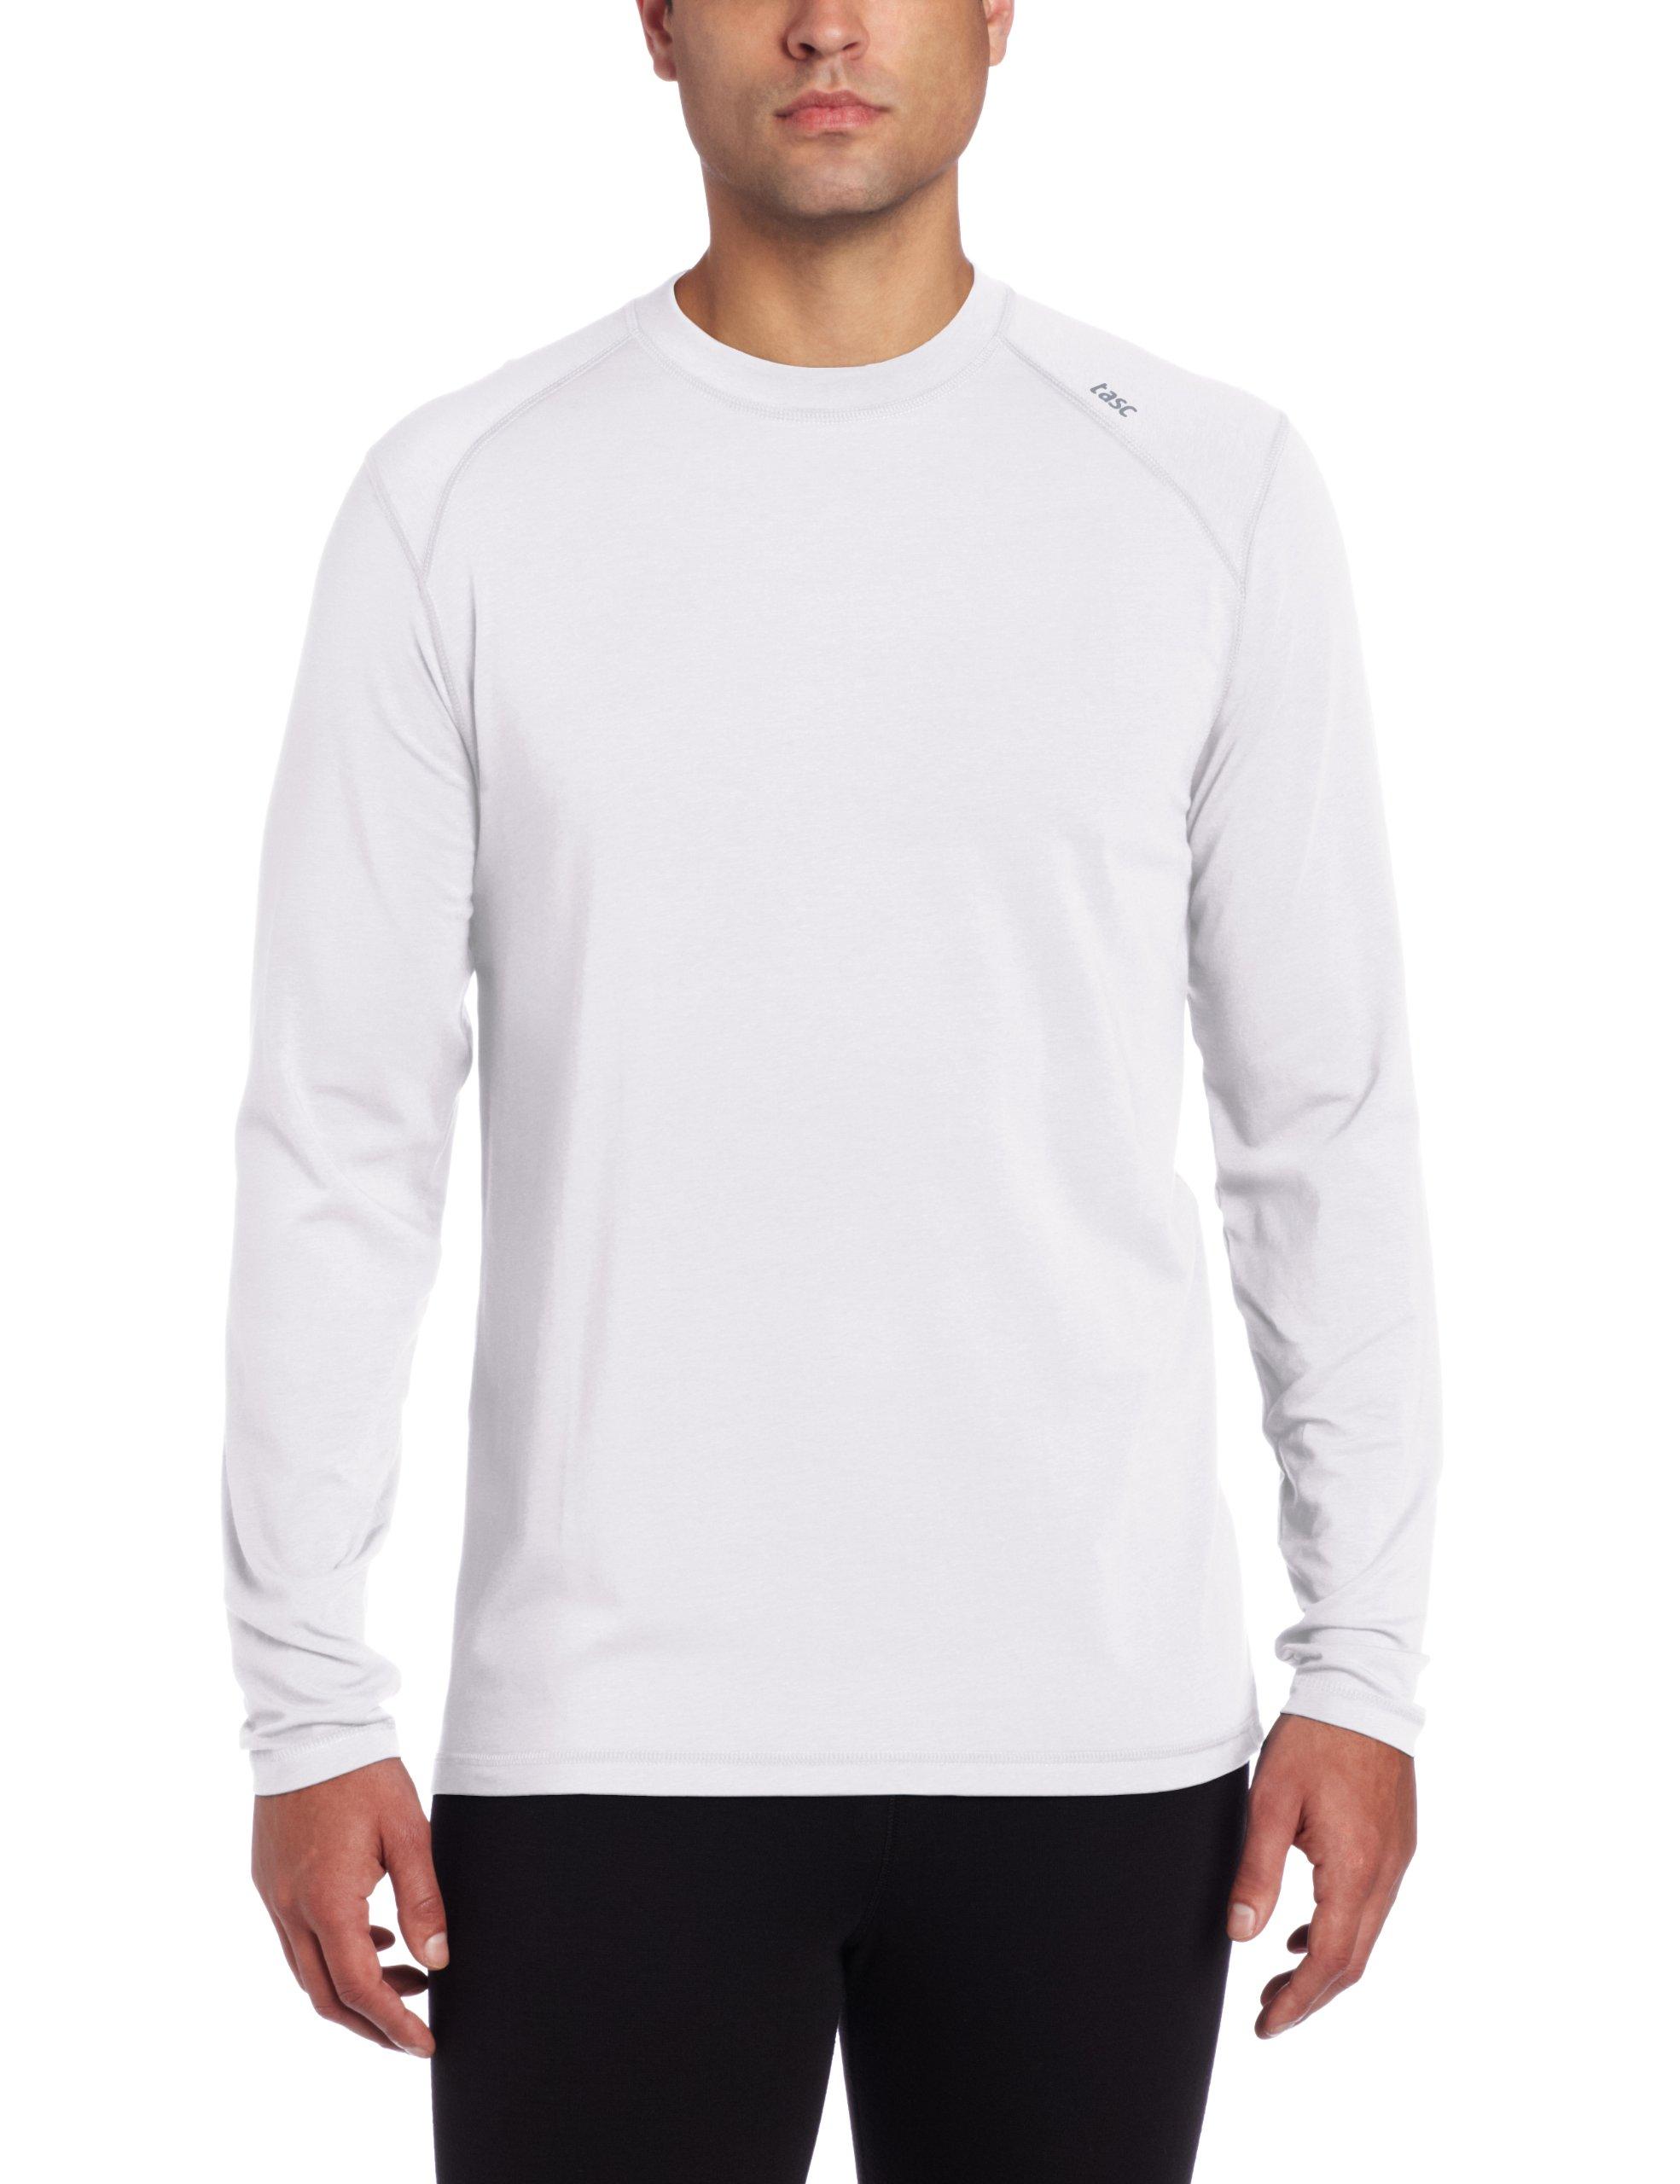 tasc Performance Carrollton Long Sleeve T-Shirt, White, X-Large